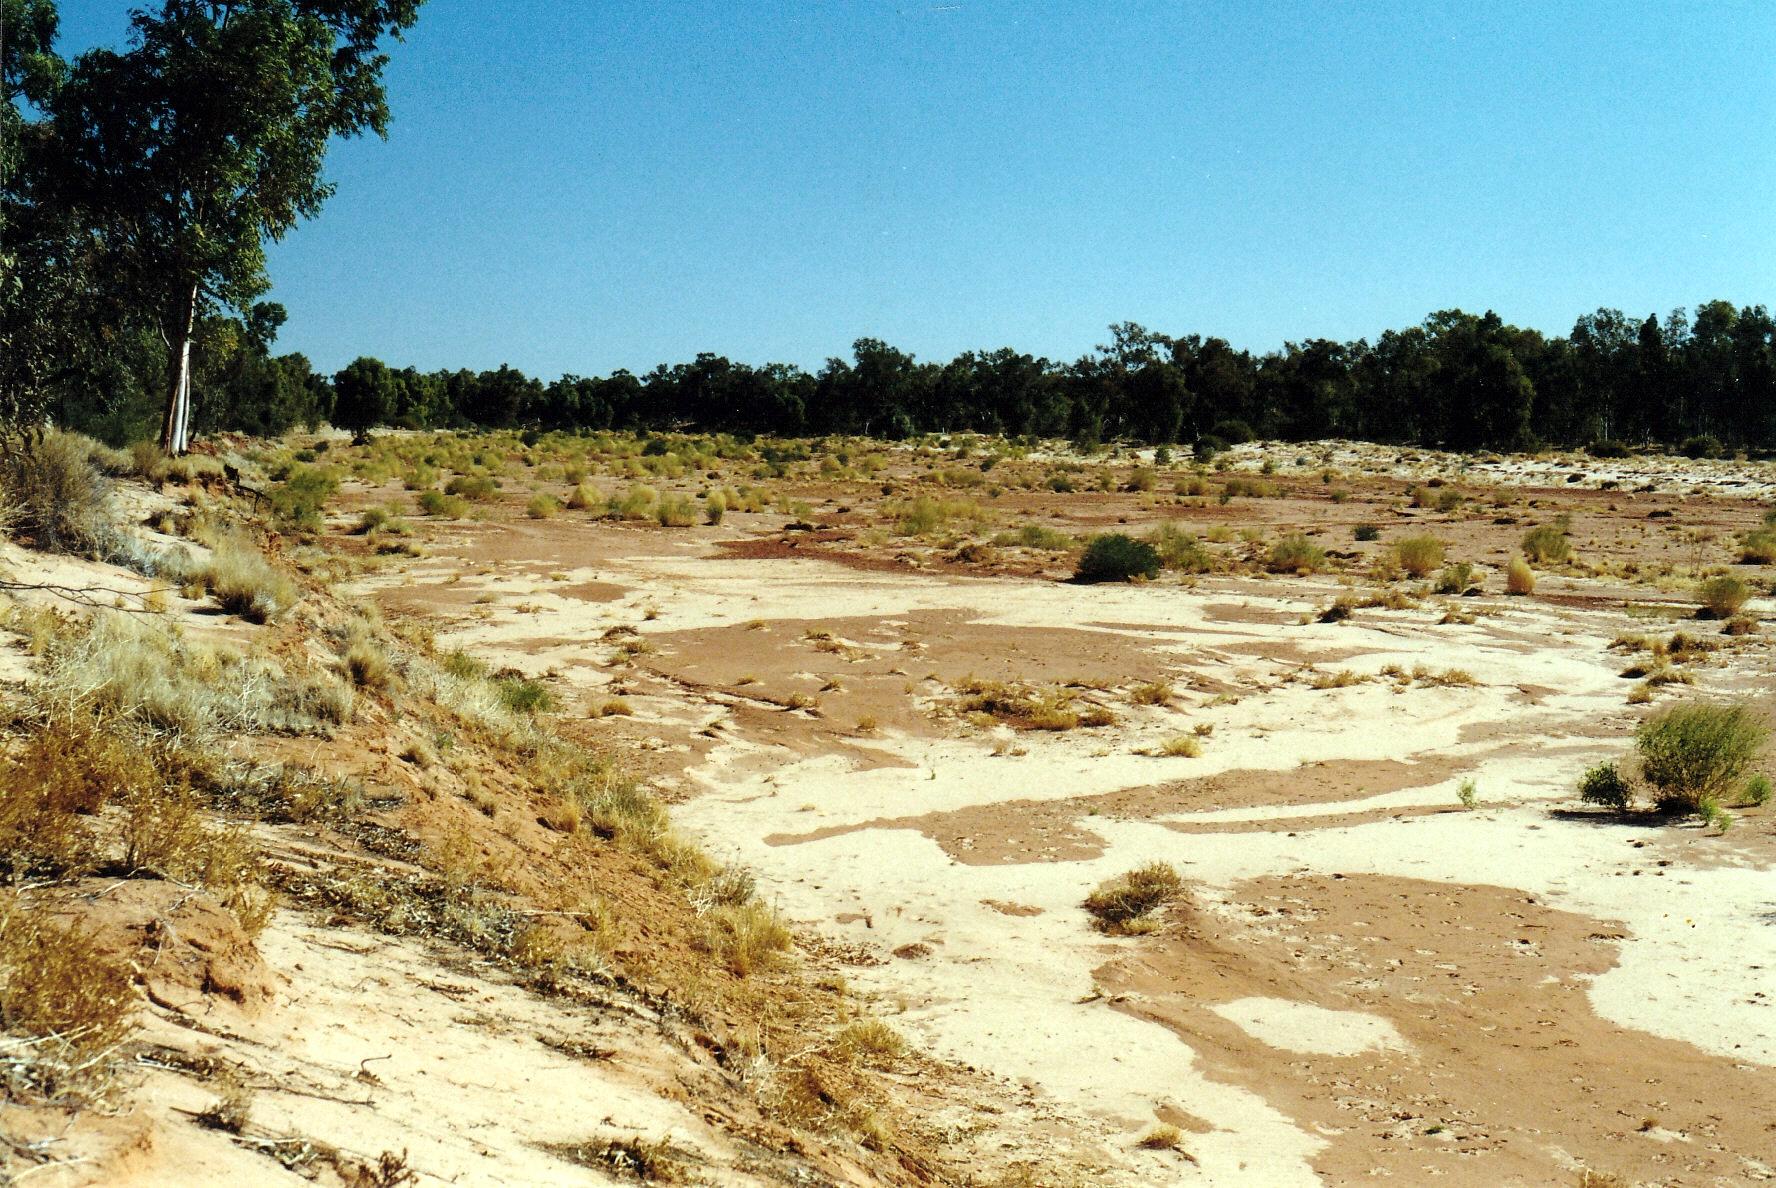 08-13-1999 finke river.jpg